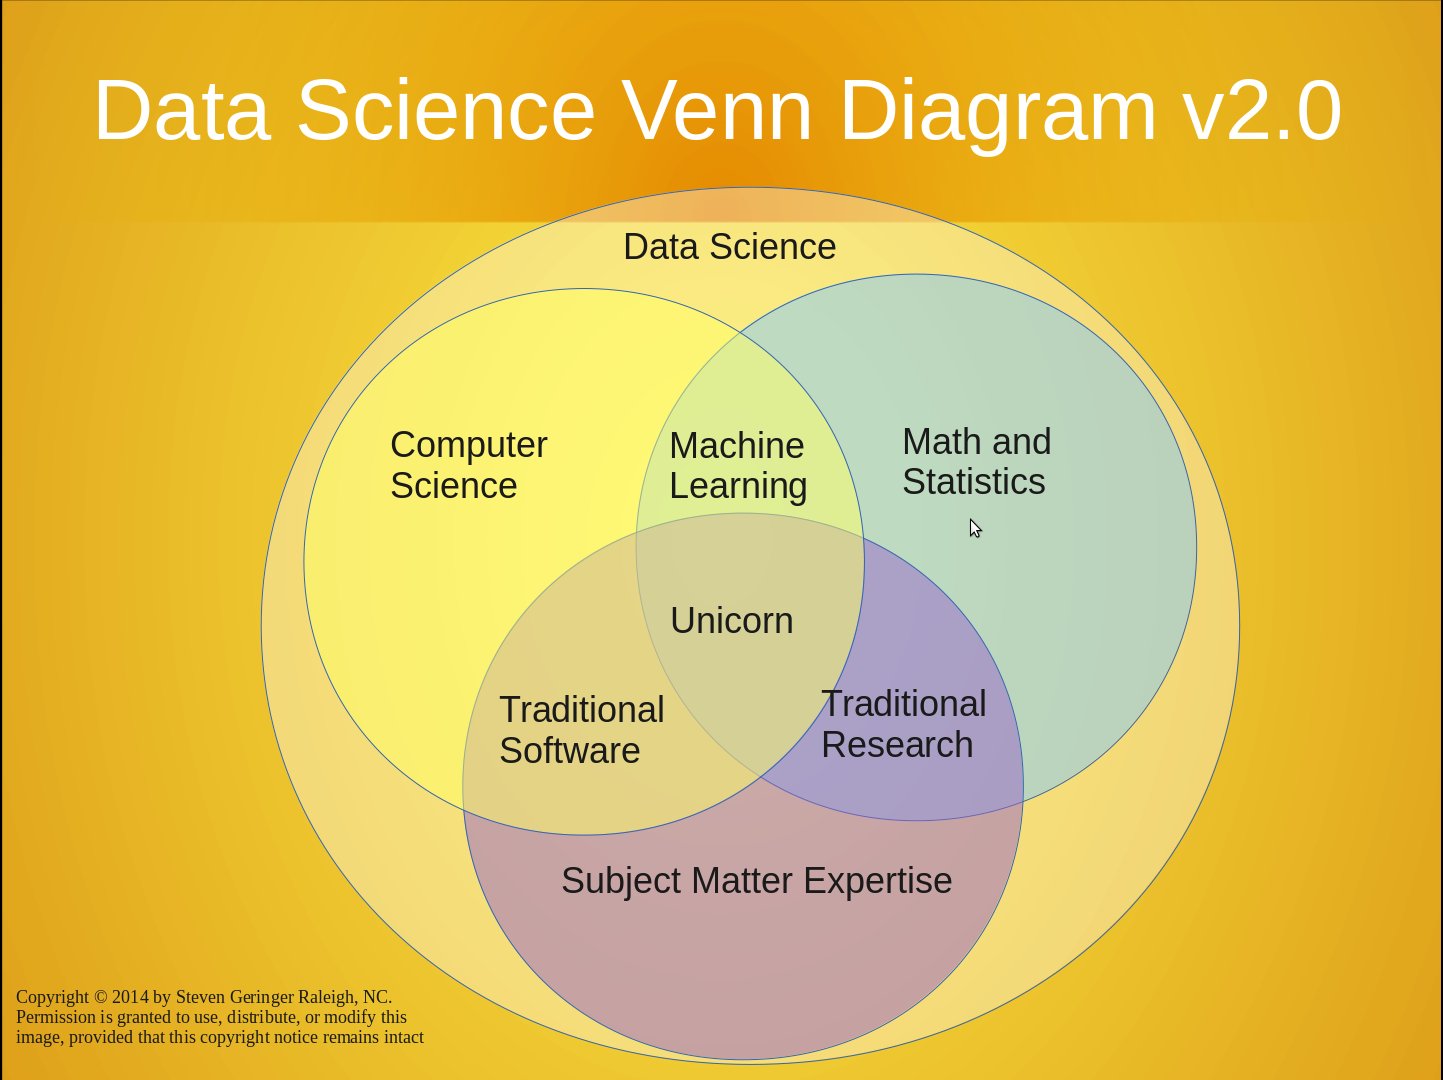 Venn-Diagram-of-Data-Scientist-Skills-